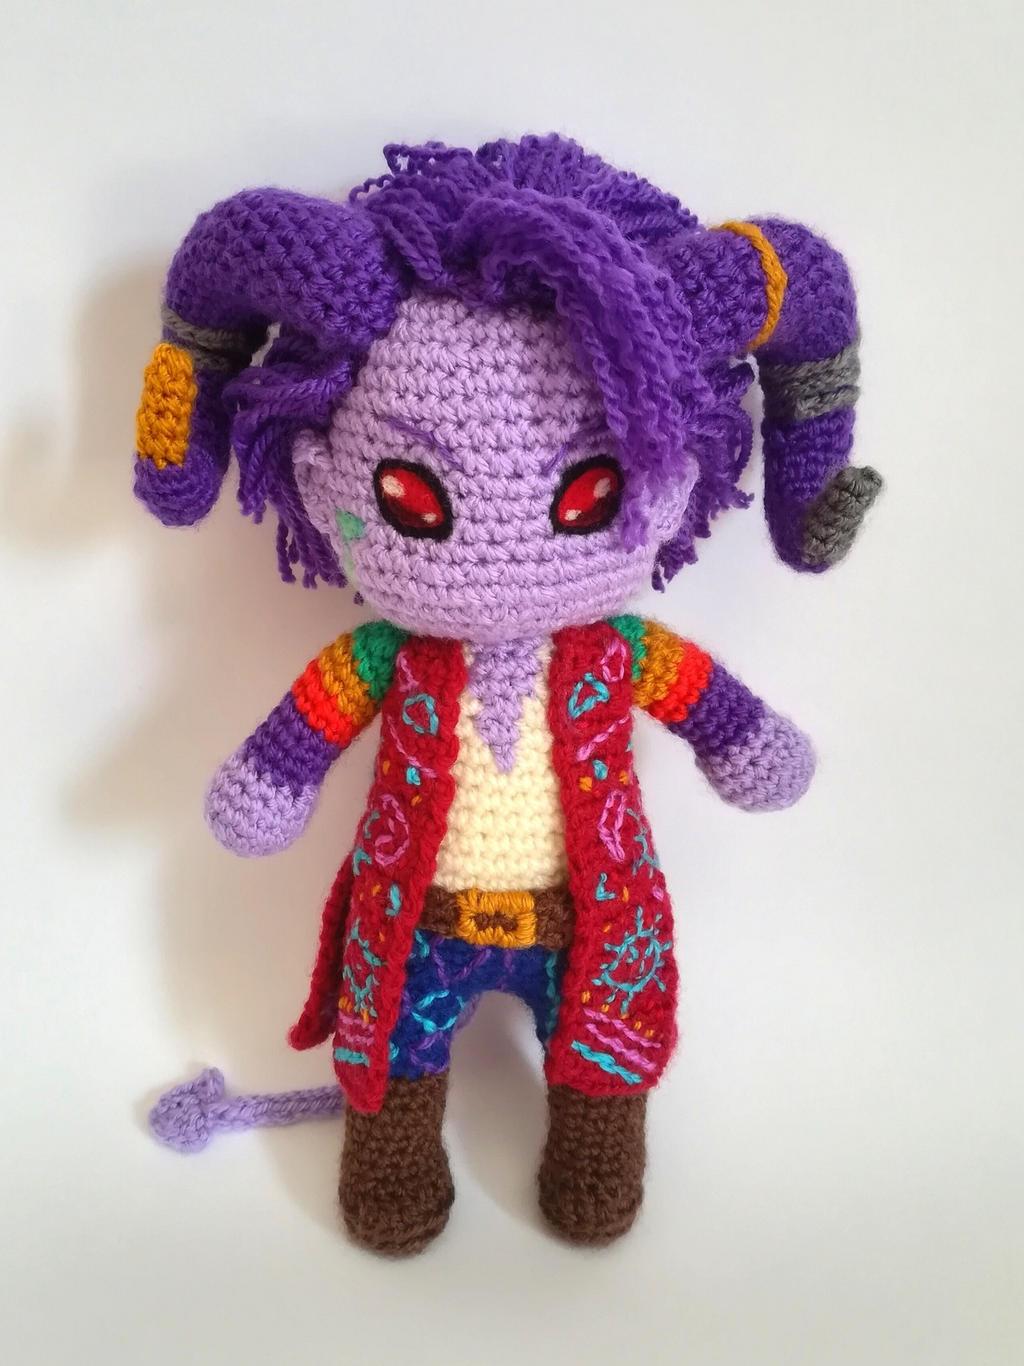 Crochet Doll Toys Free Patterns | 1366x1024